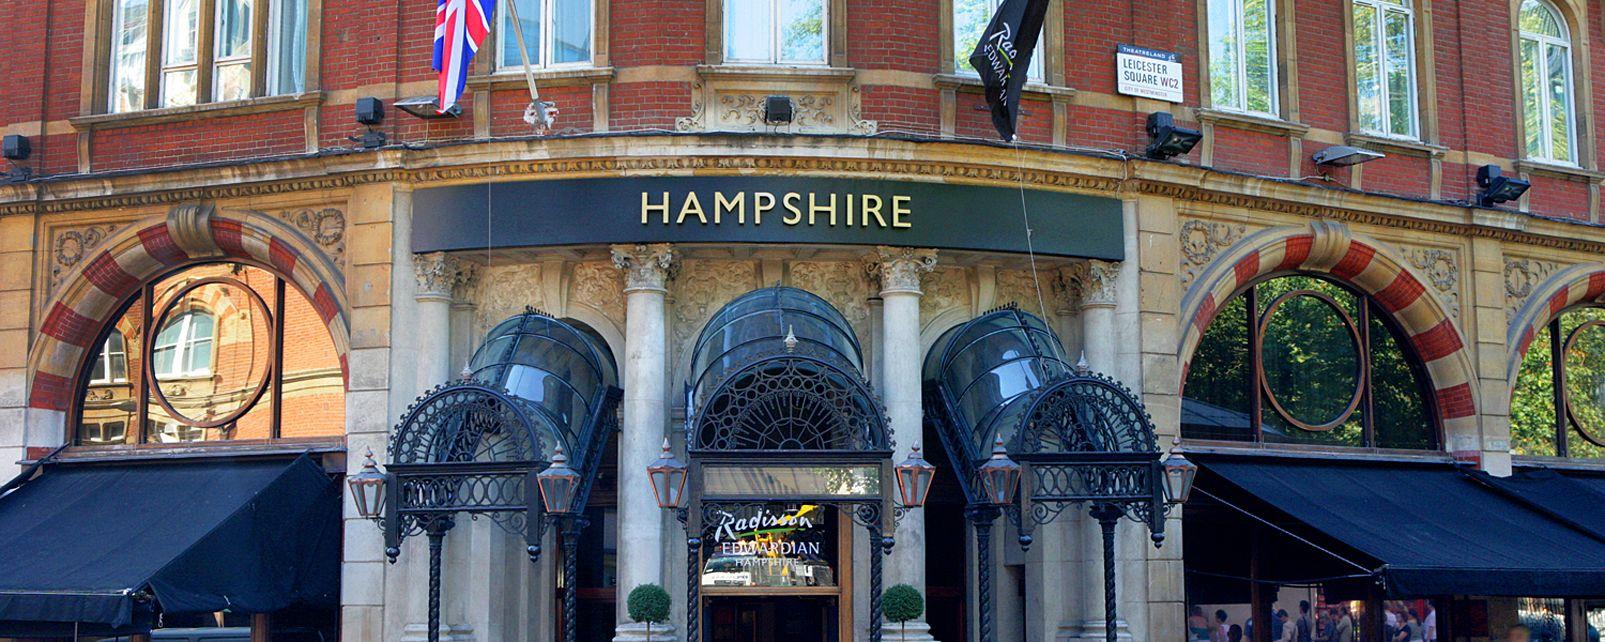 Hotel Hampshire